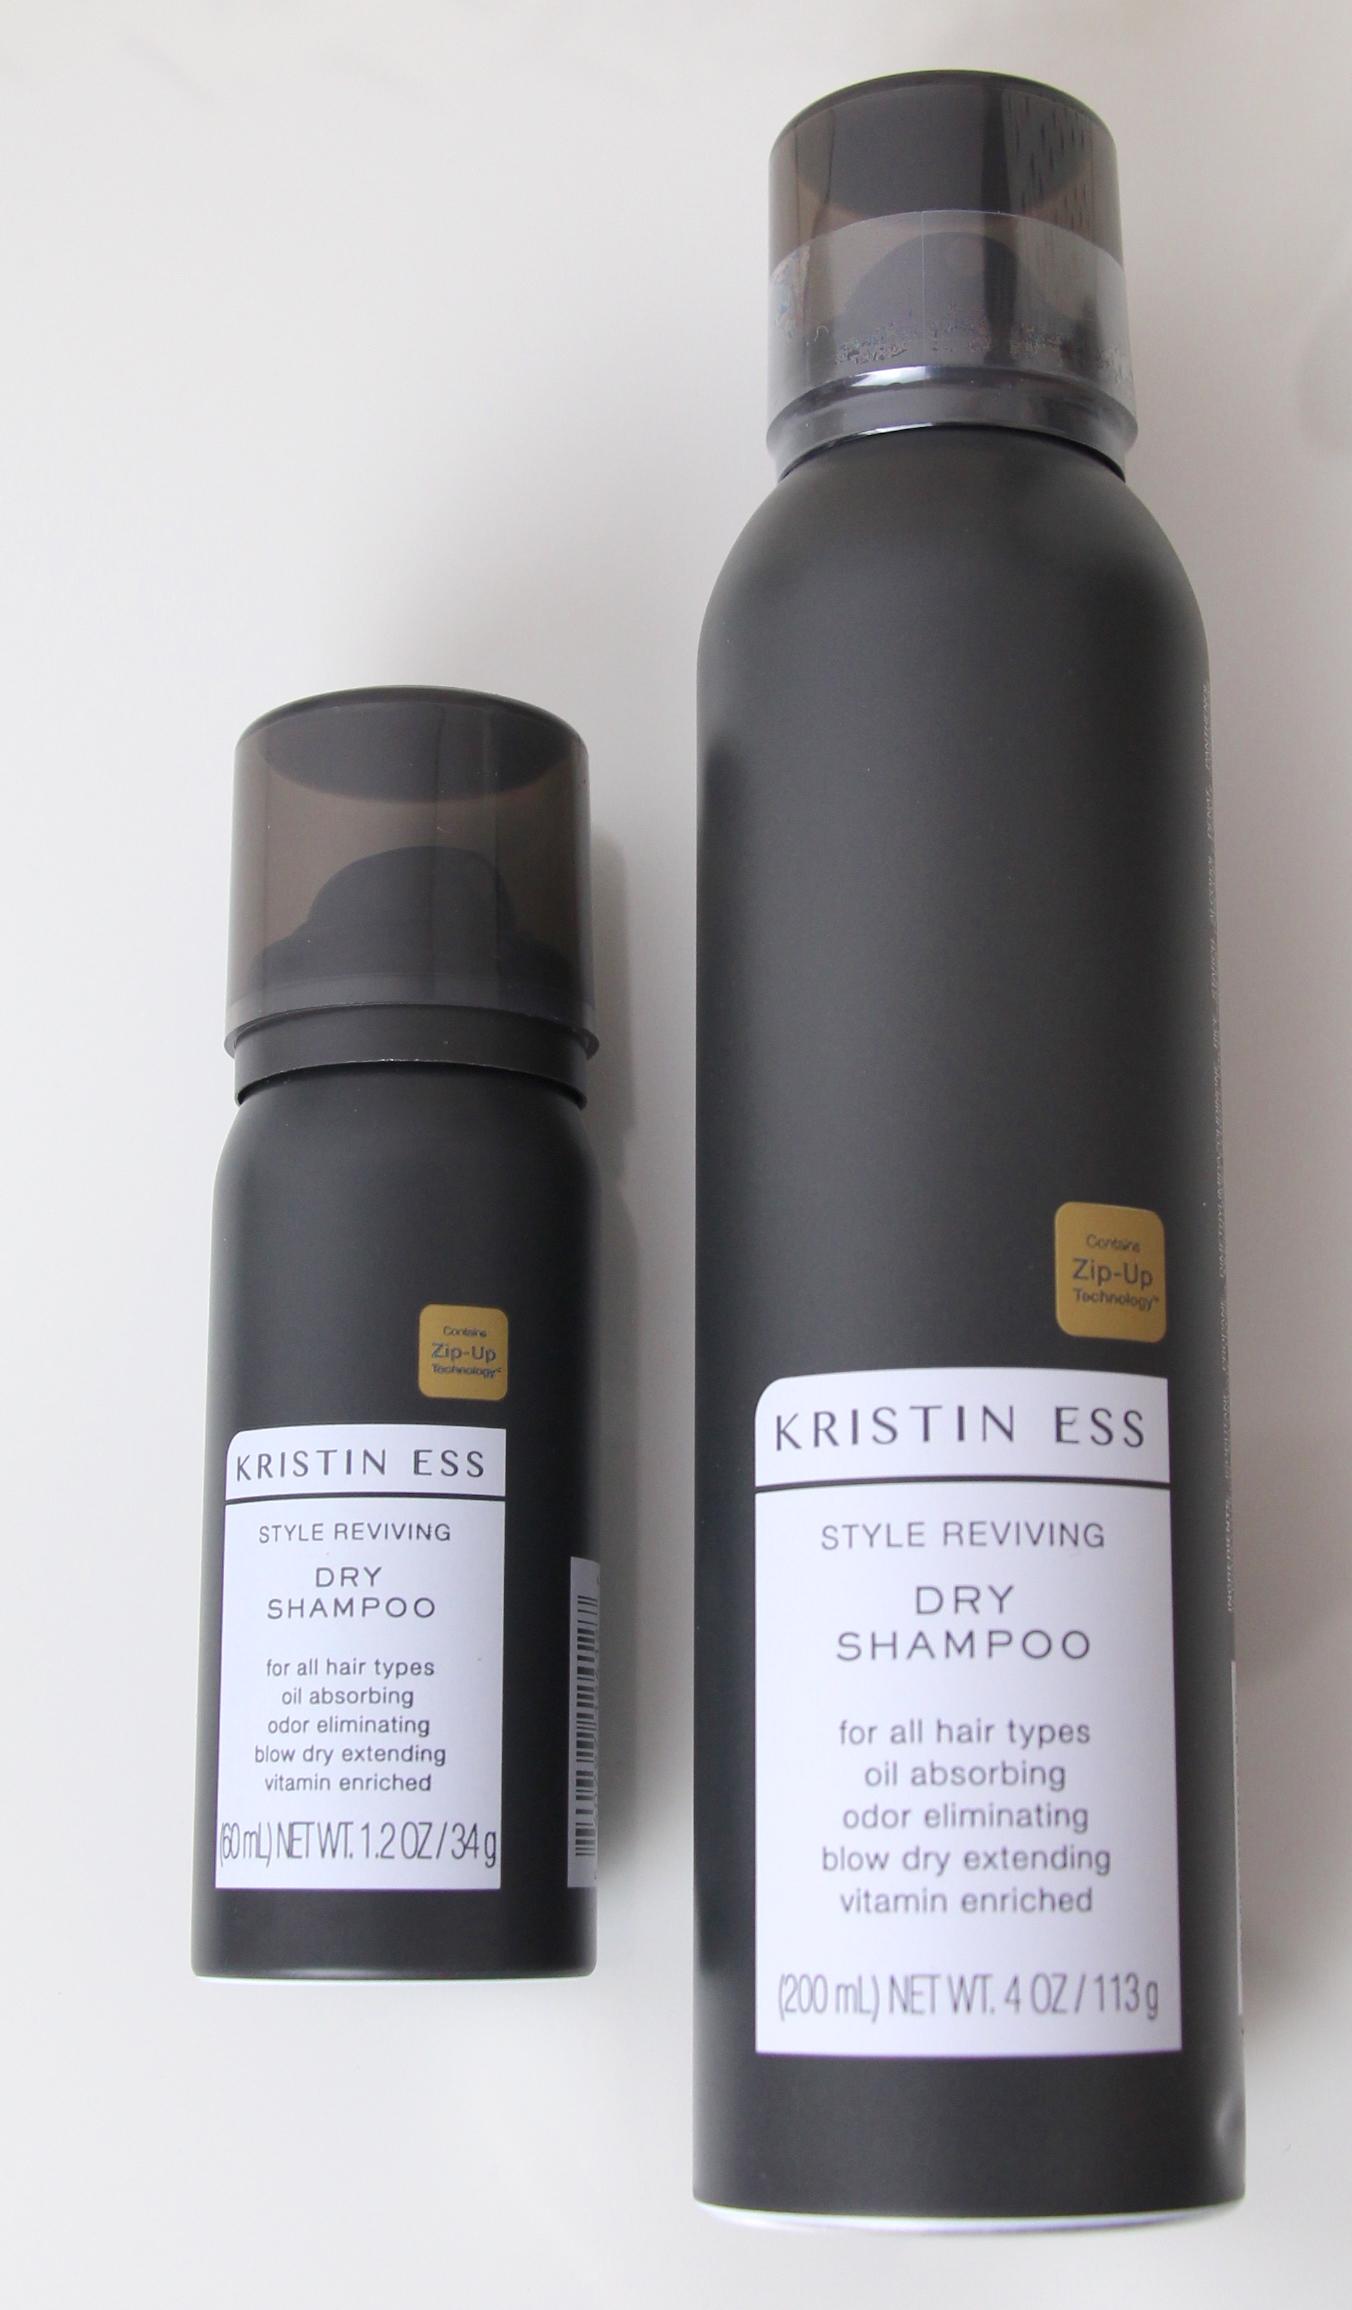 Kristin Ess Dry Shampoo Target